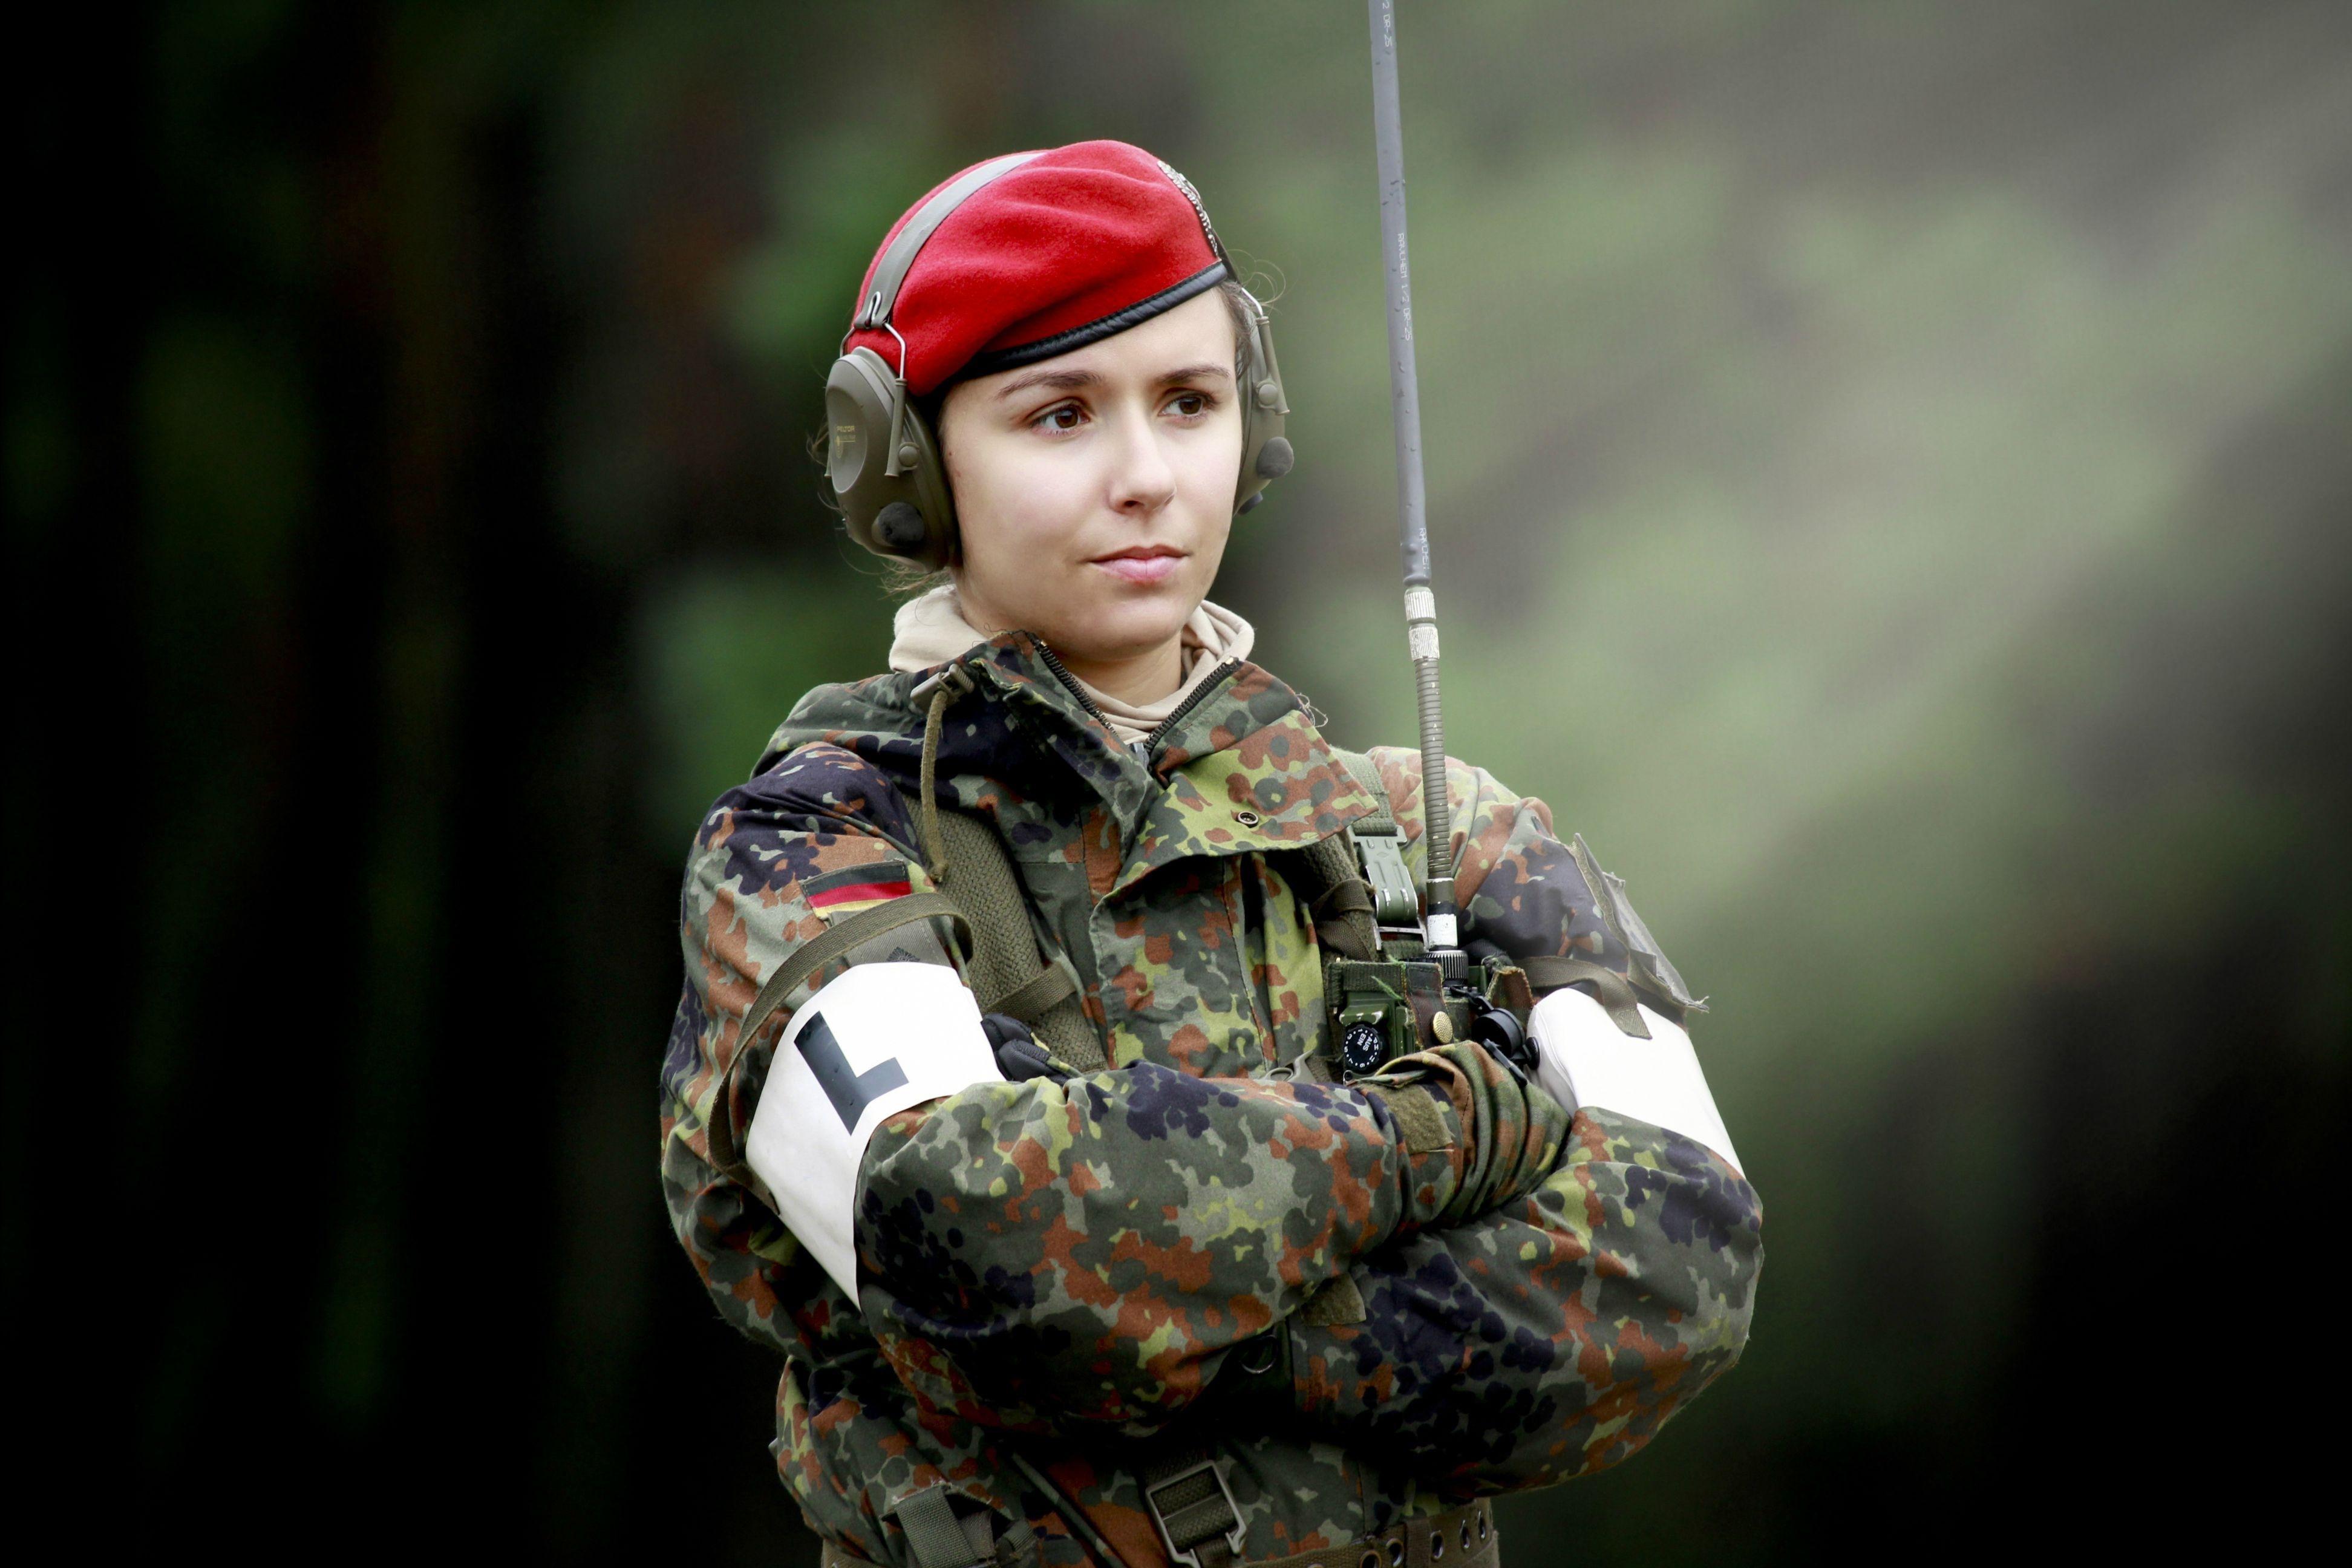 Police Officer Girl Wallpaper Amazing Soldier Wallpaper Soldier Category Ololoshenka